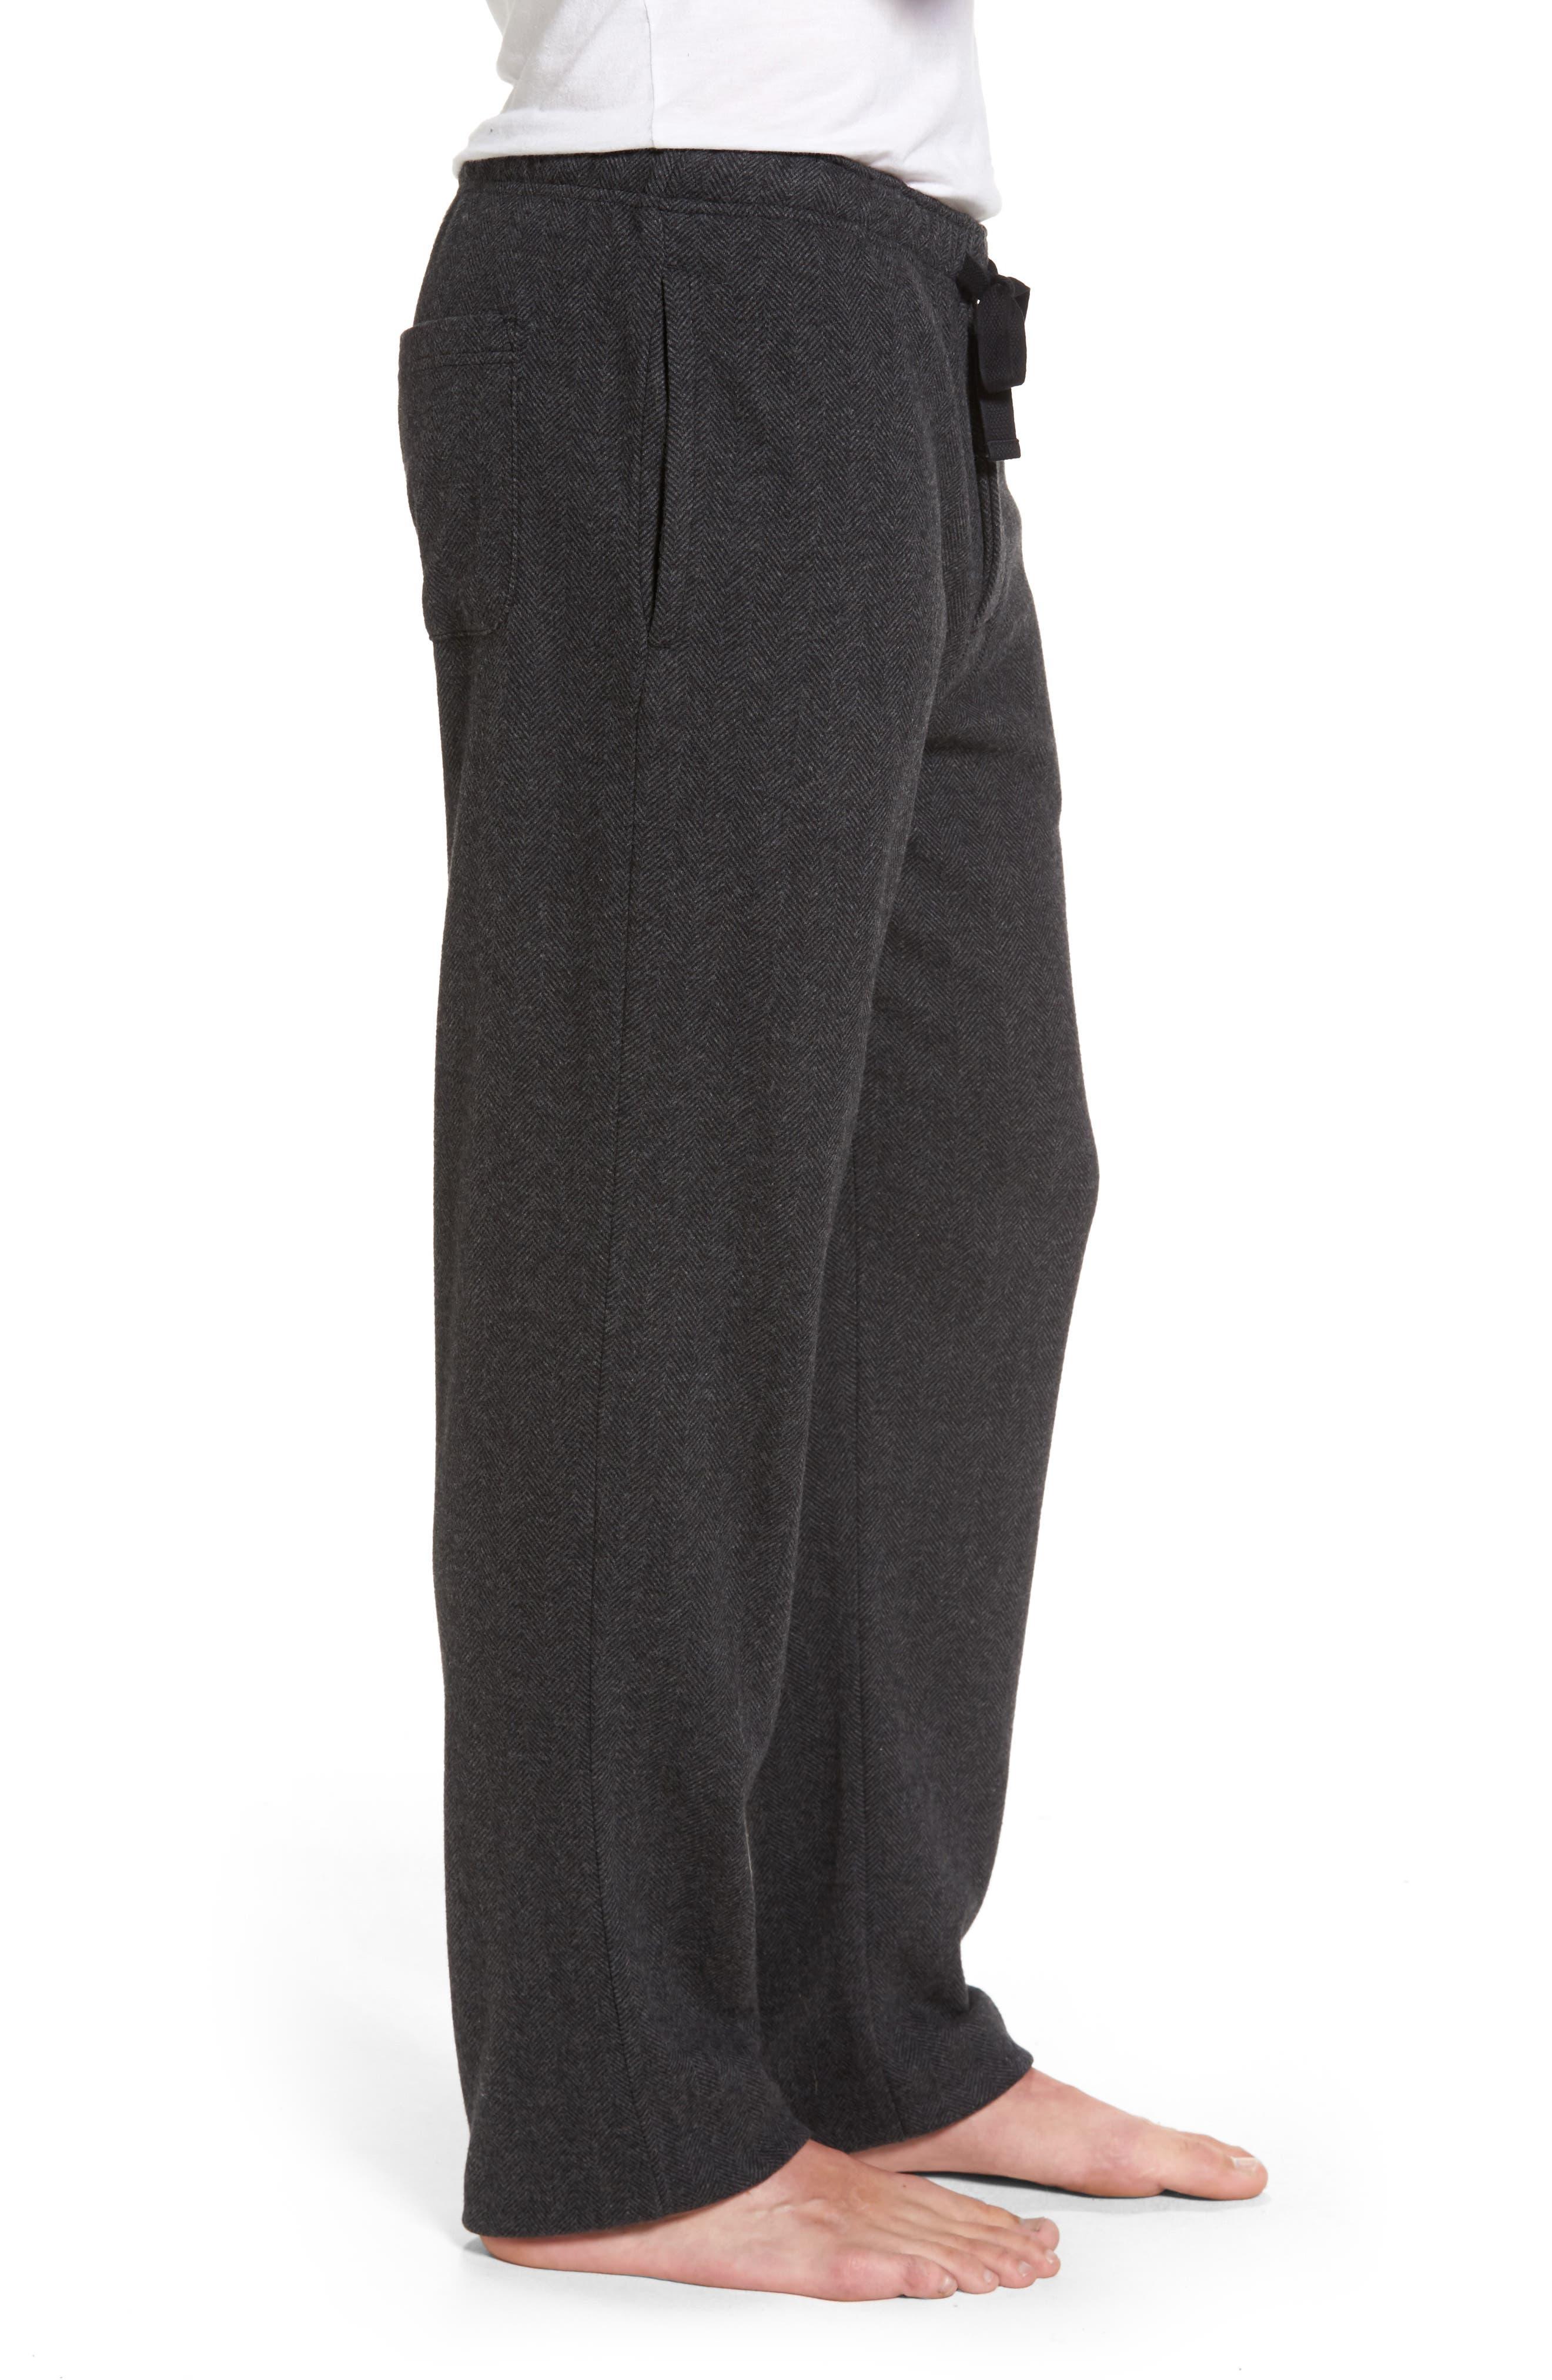 Grayson Lounge Pants,                             Alternate thumbnail 3, color,                             Charcoal